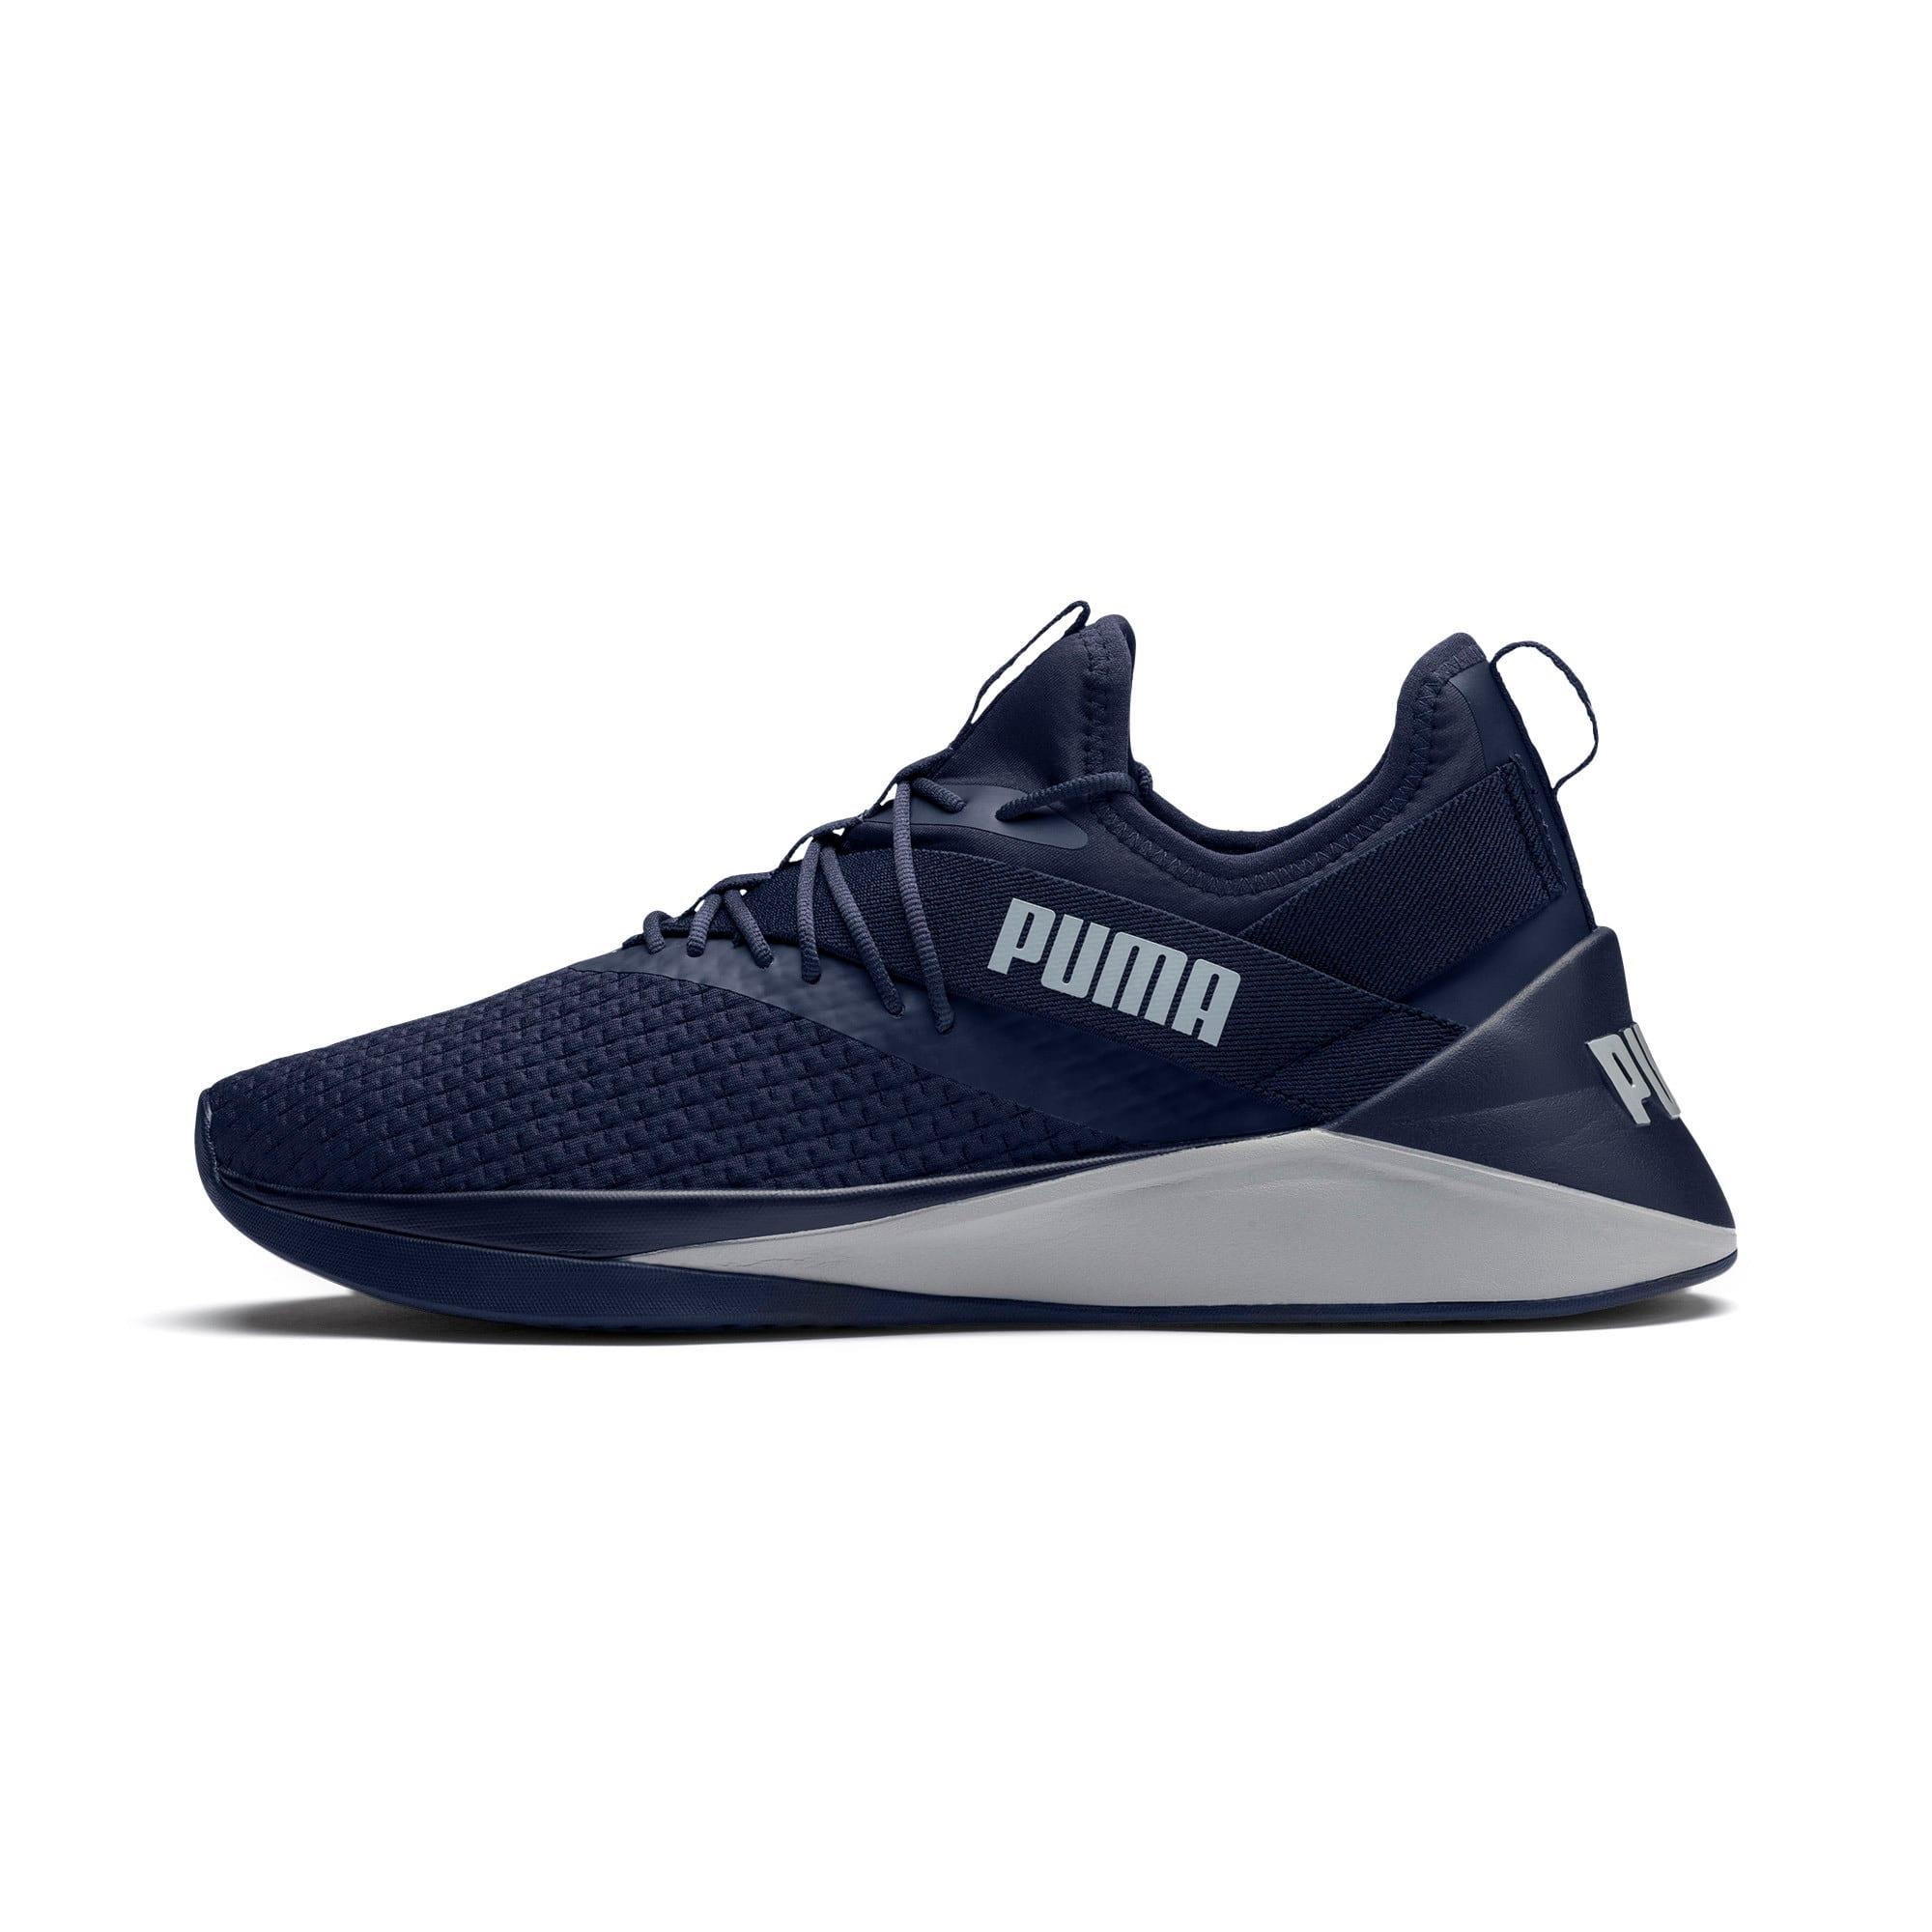 Thumbnail 1 of Jaab XT Men's Training Shoes, Peacoat-Quarry, medium